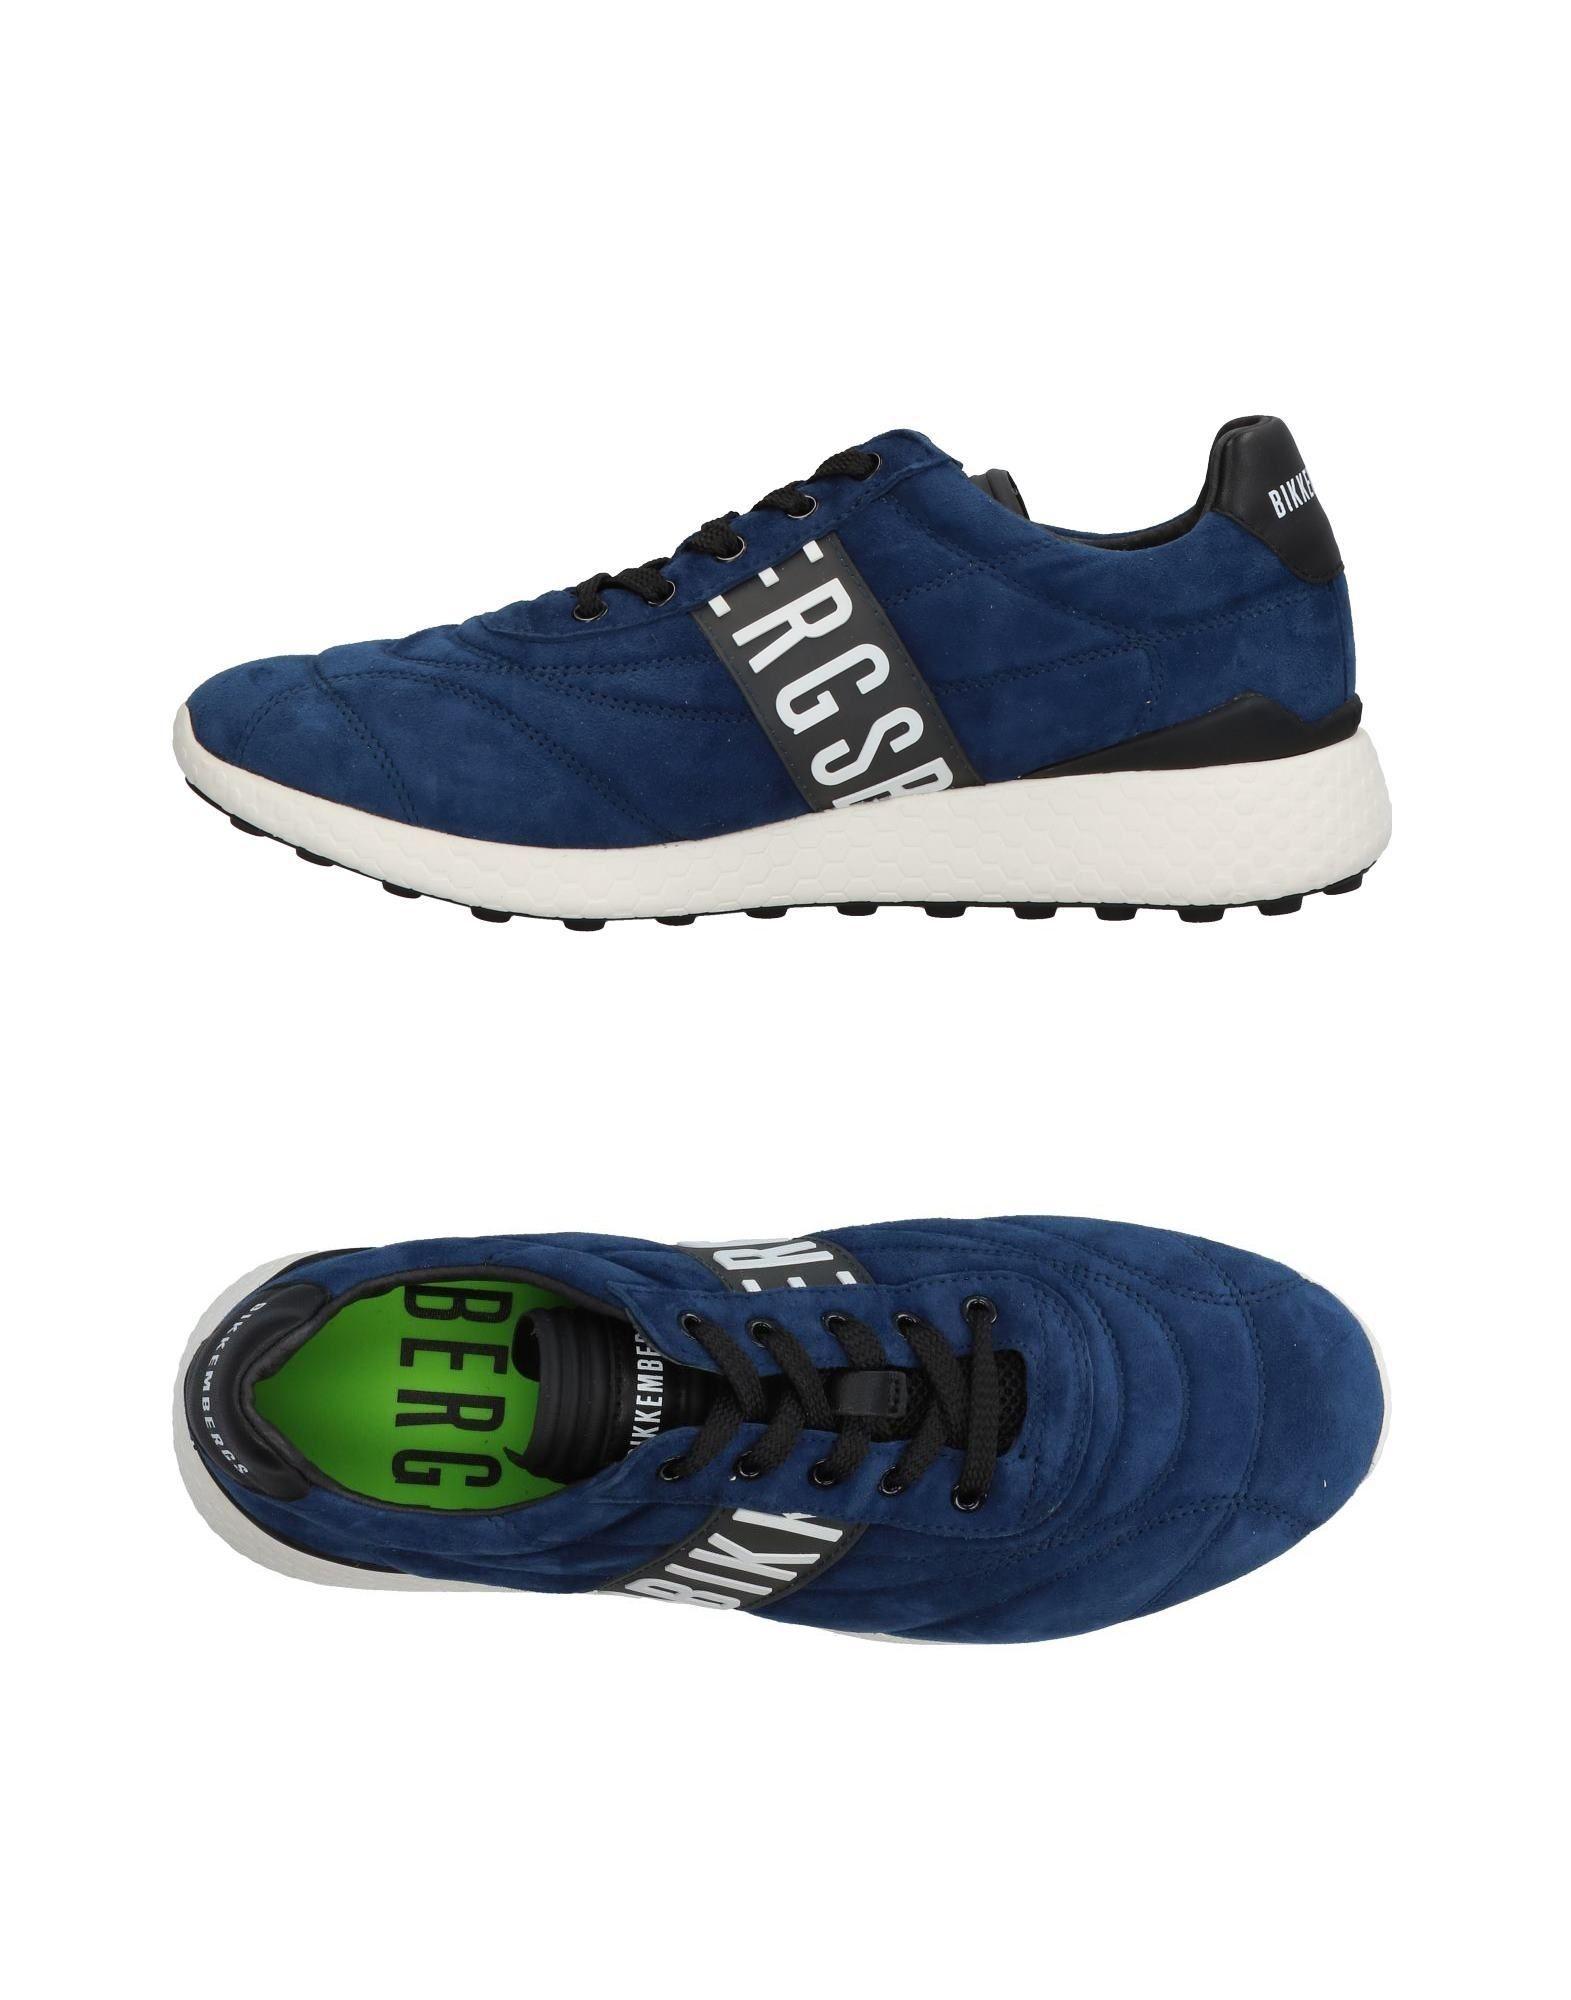 Bikkembergs on Sneakers - Men Bikkembergs Sneakers online on Bikkembergs  Australia - 11326257JE fc9bff